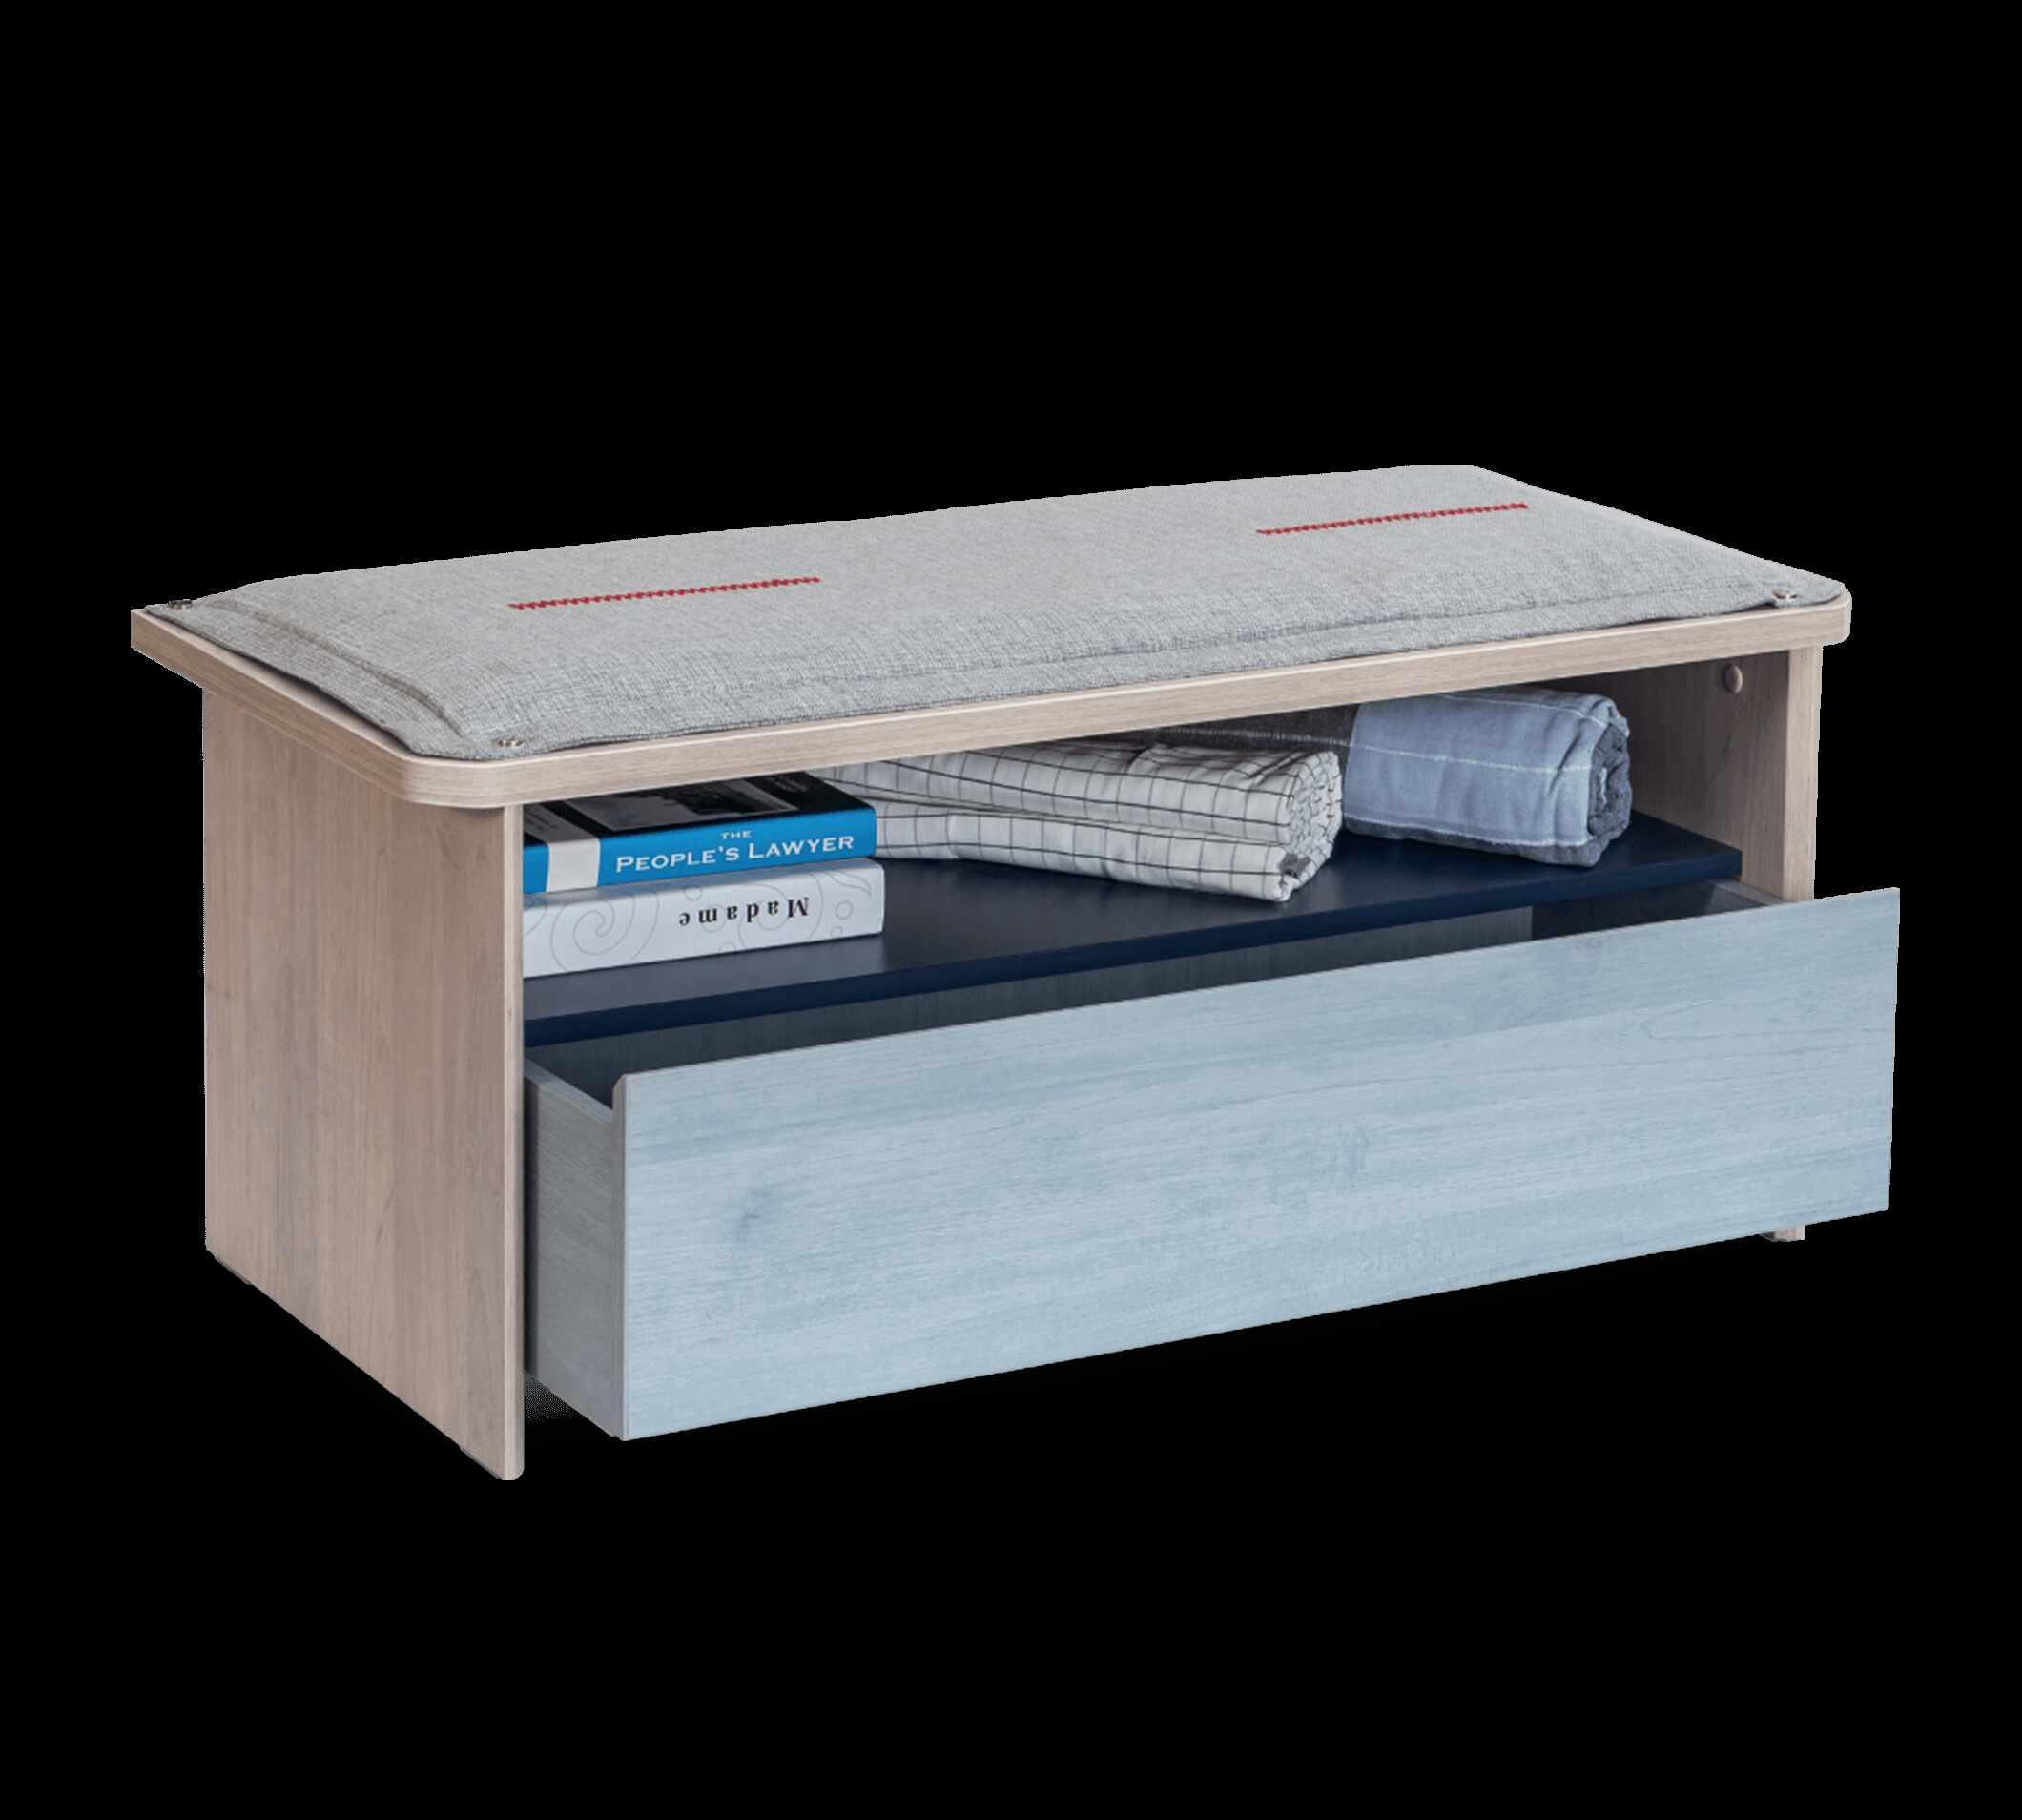 Banca din pal cu 1 sertar pentru tineret, baieti 12-24 ani, Trio Natur / Blue, l98xA43xH43 cm la pret 605 lei